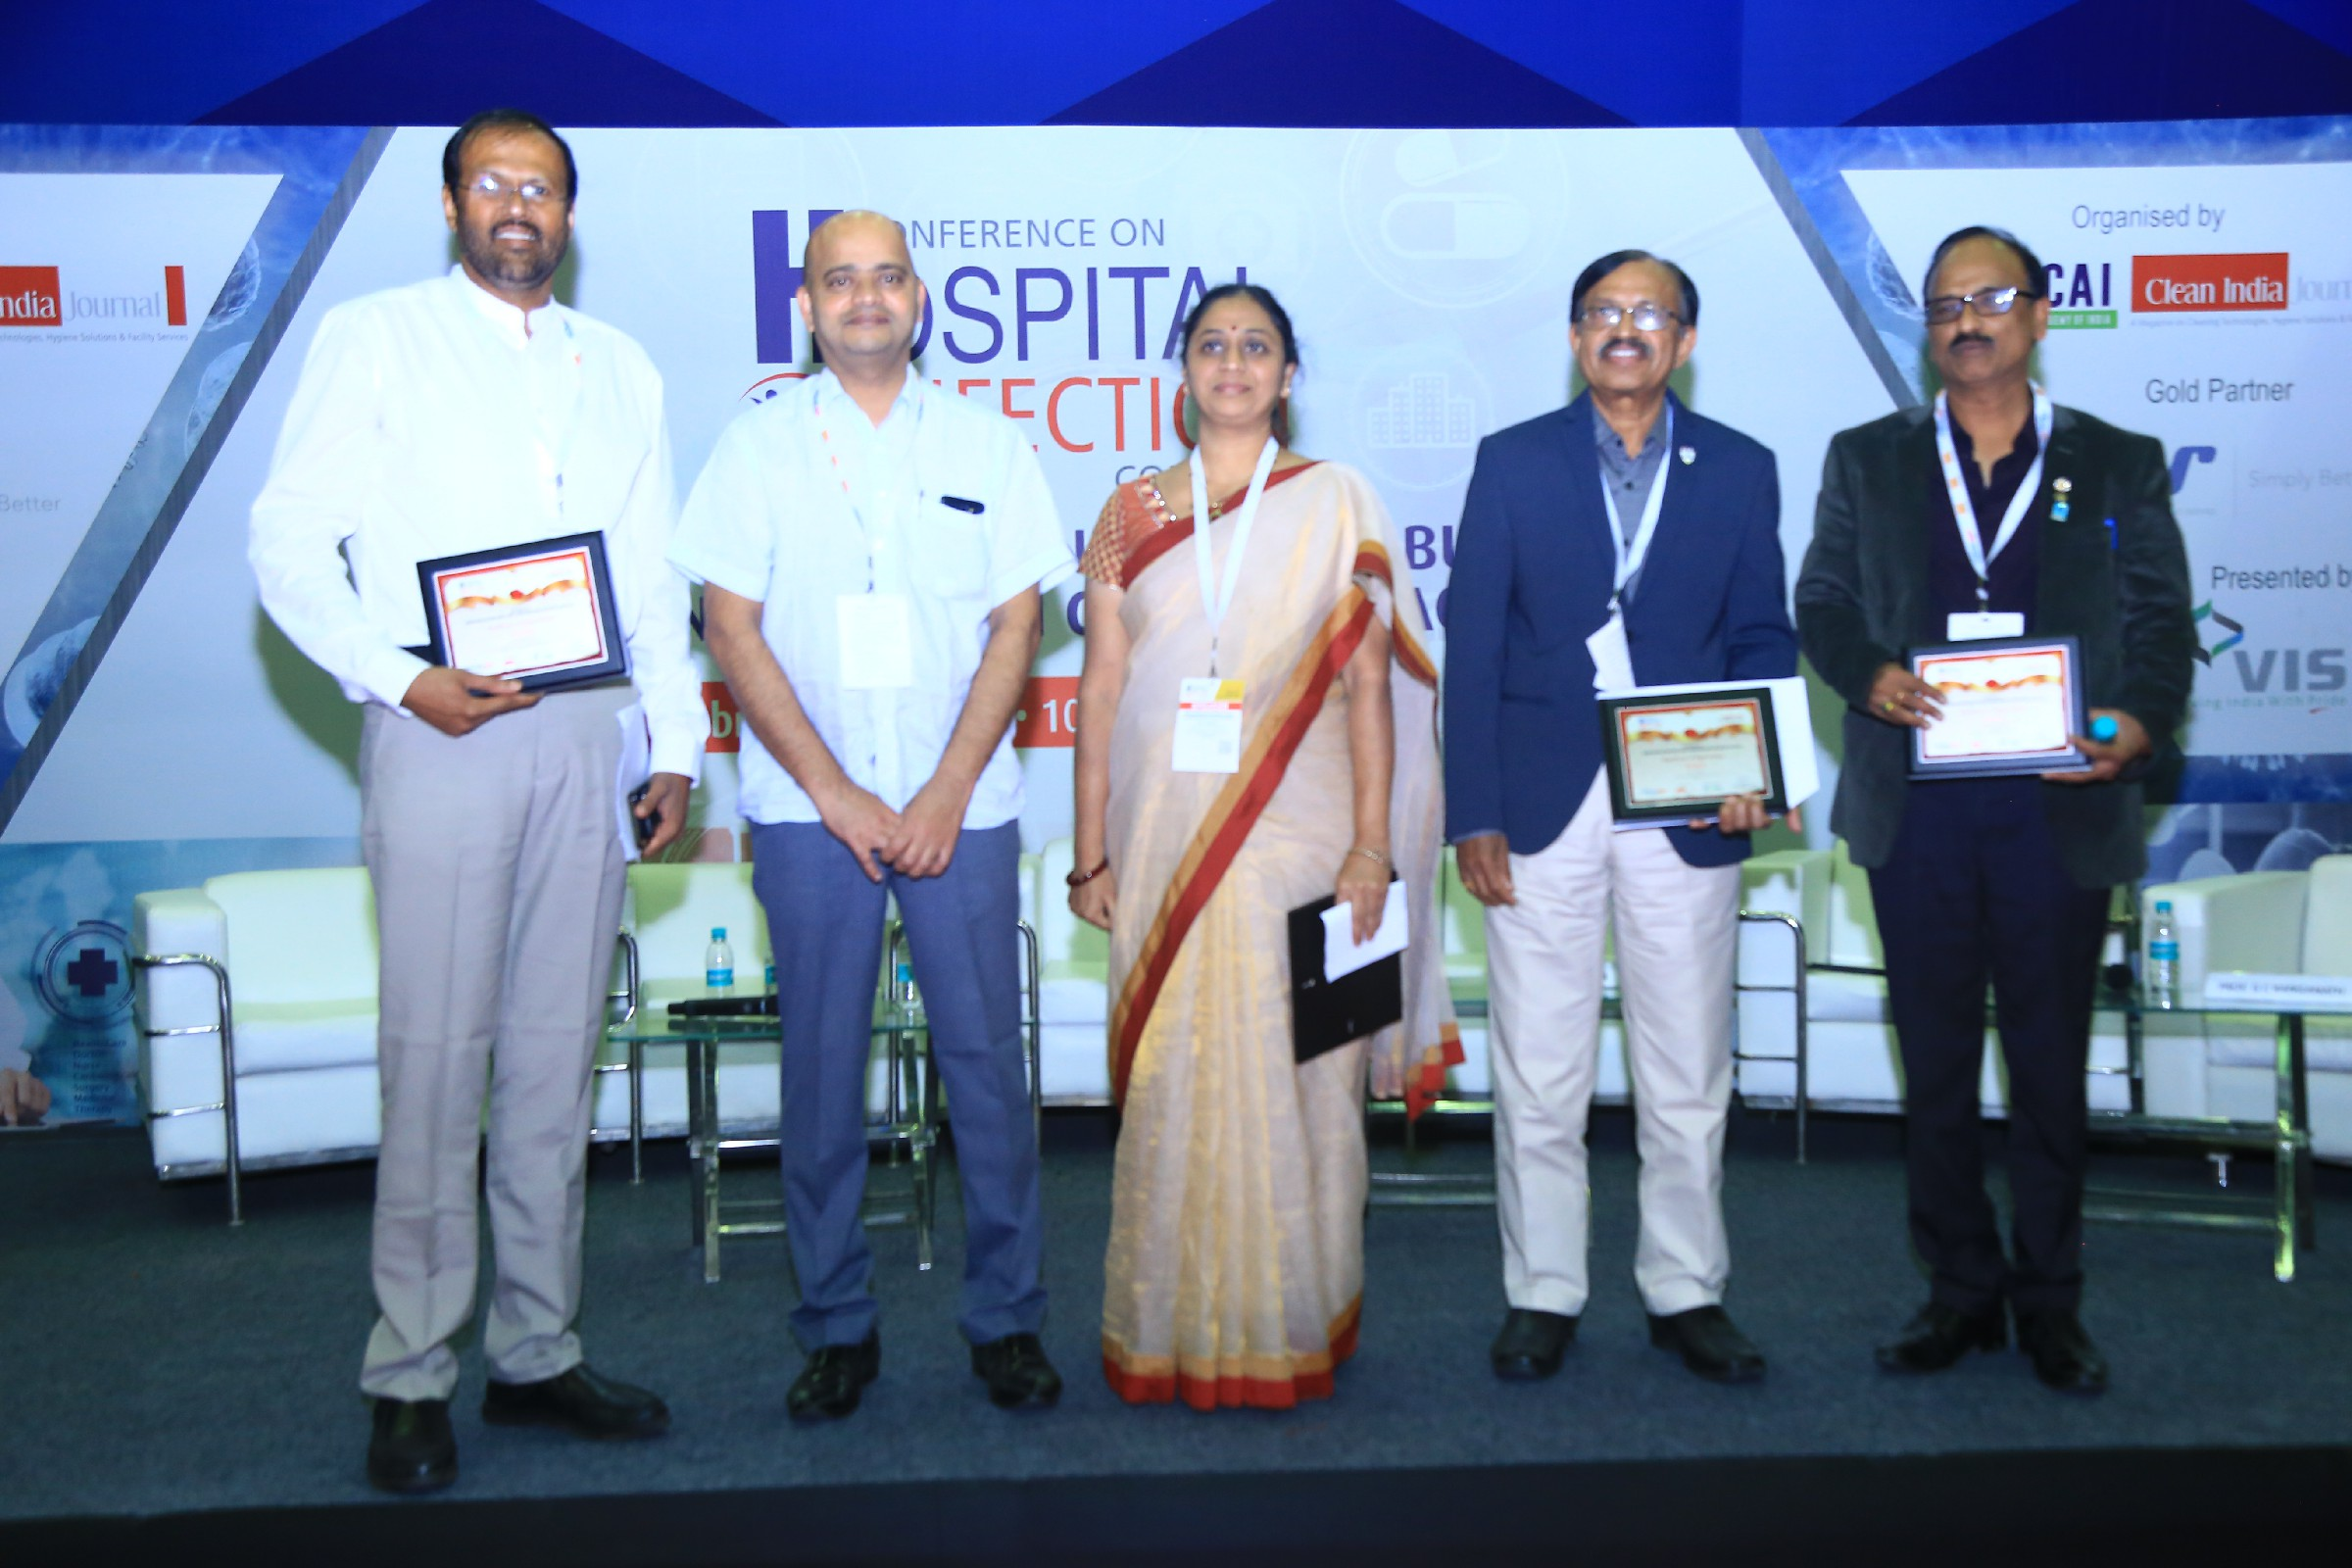 Left-to-Right-Dr-Narendranath-V-Dr.-T.-Hemanth-Dr-Suman-Dr-V.-Raju-Prof-G-C-Ranganath-1